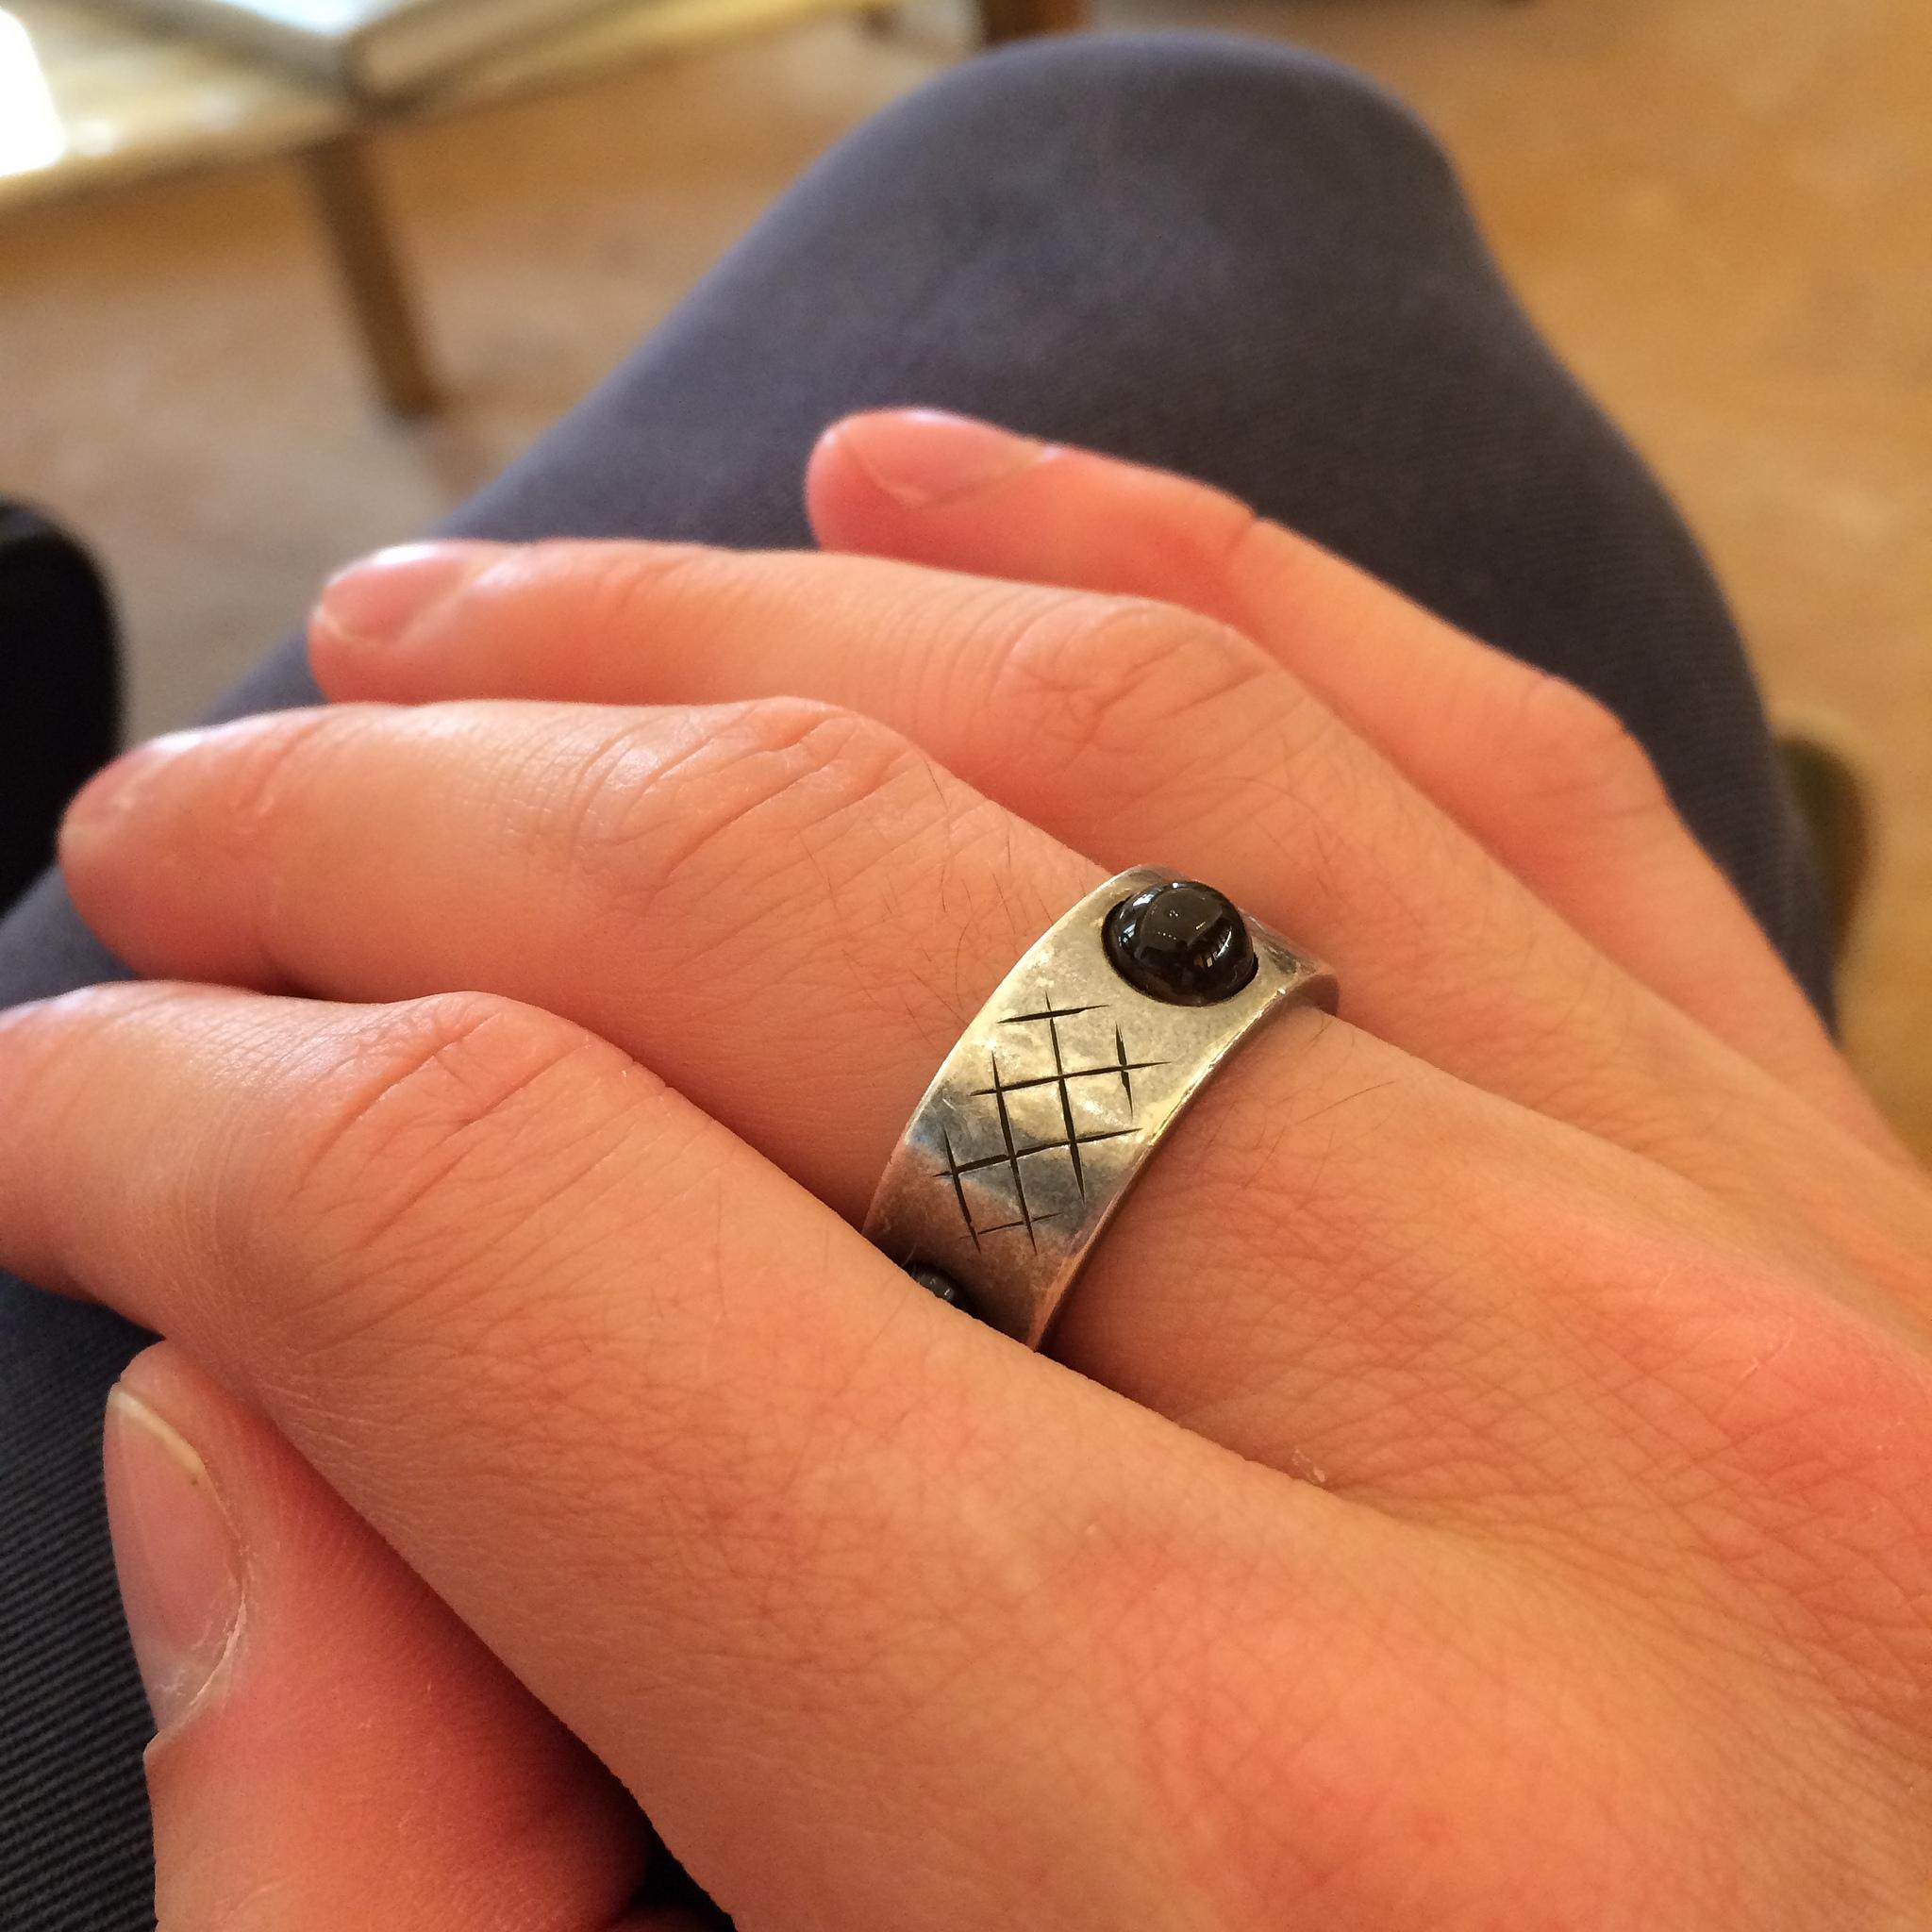 467ab44944 Bottega Veneta men's sterling silver ring with smoked quartz stones